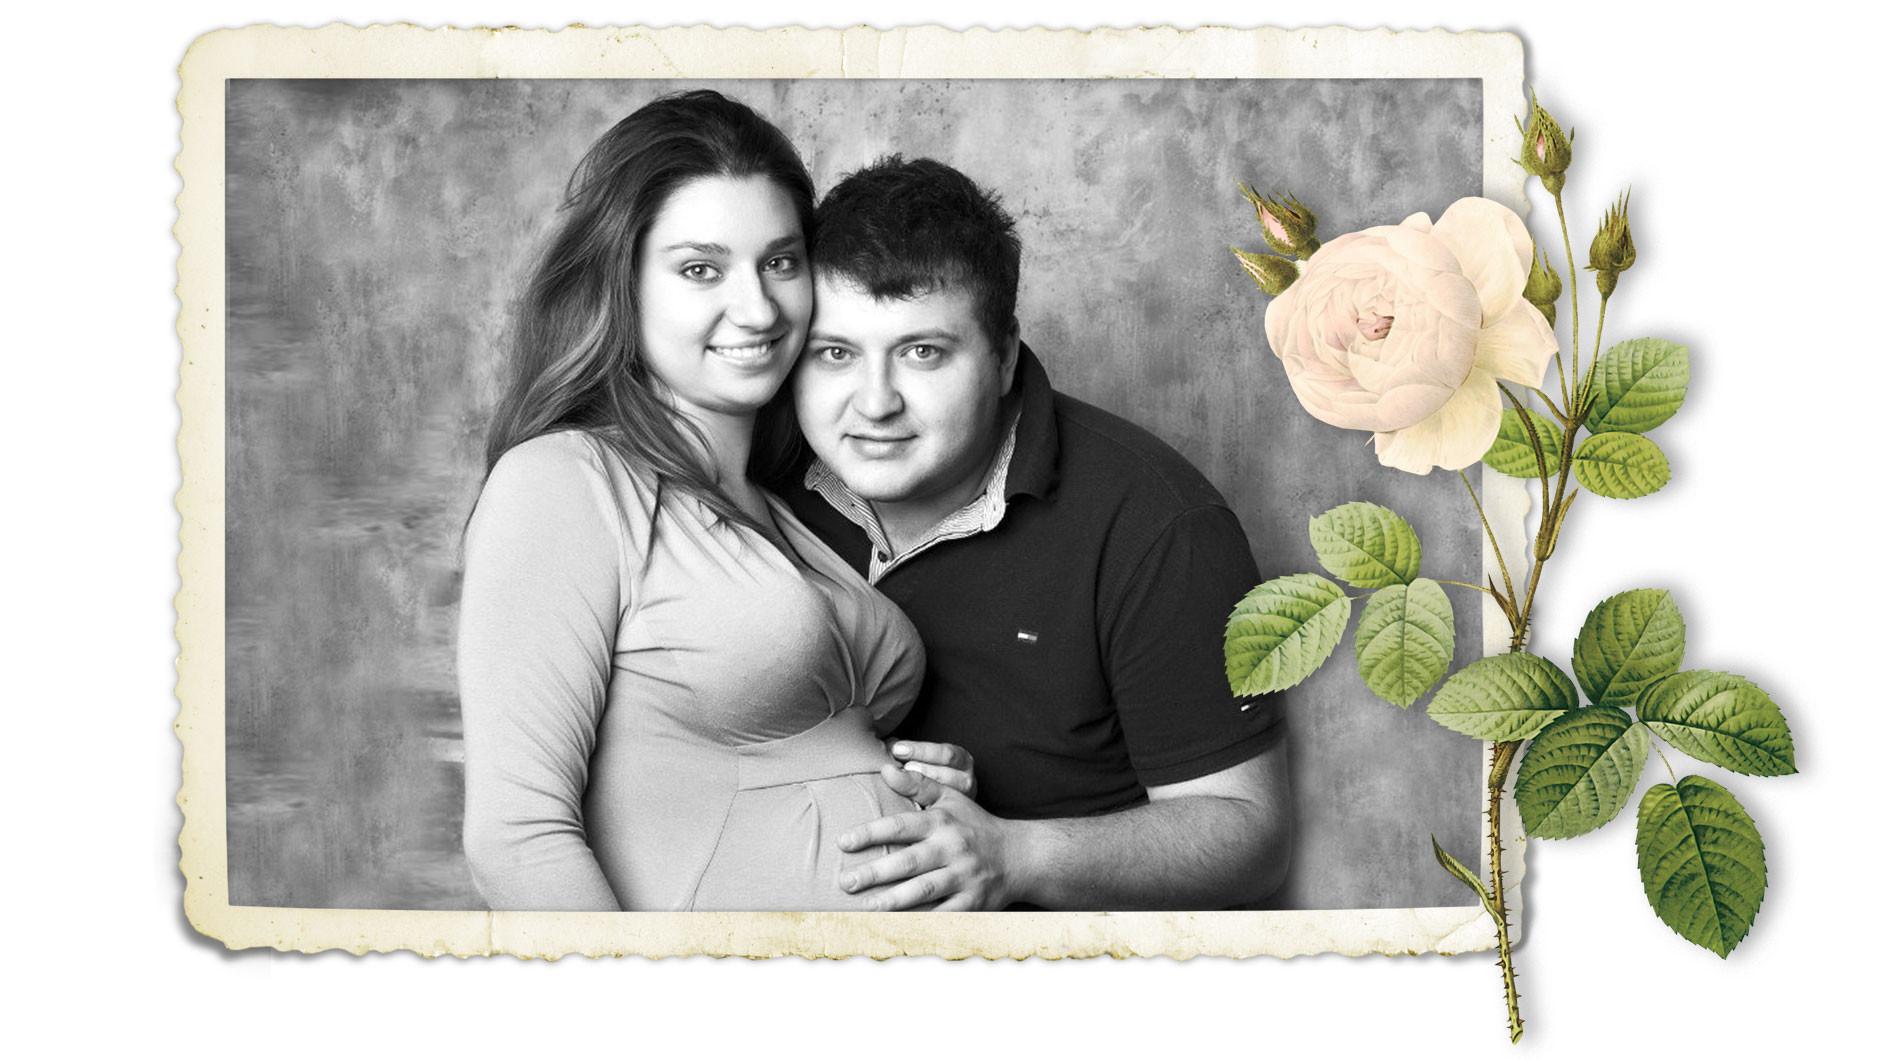 Анастасия и Мстислав Камашевы. Коллаж © L!FE Фото: © vk.com